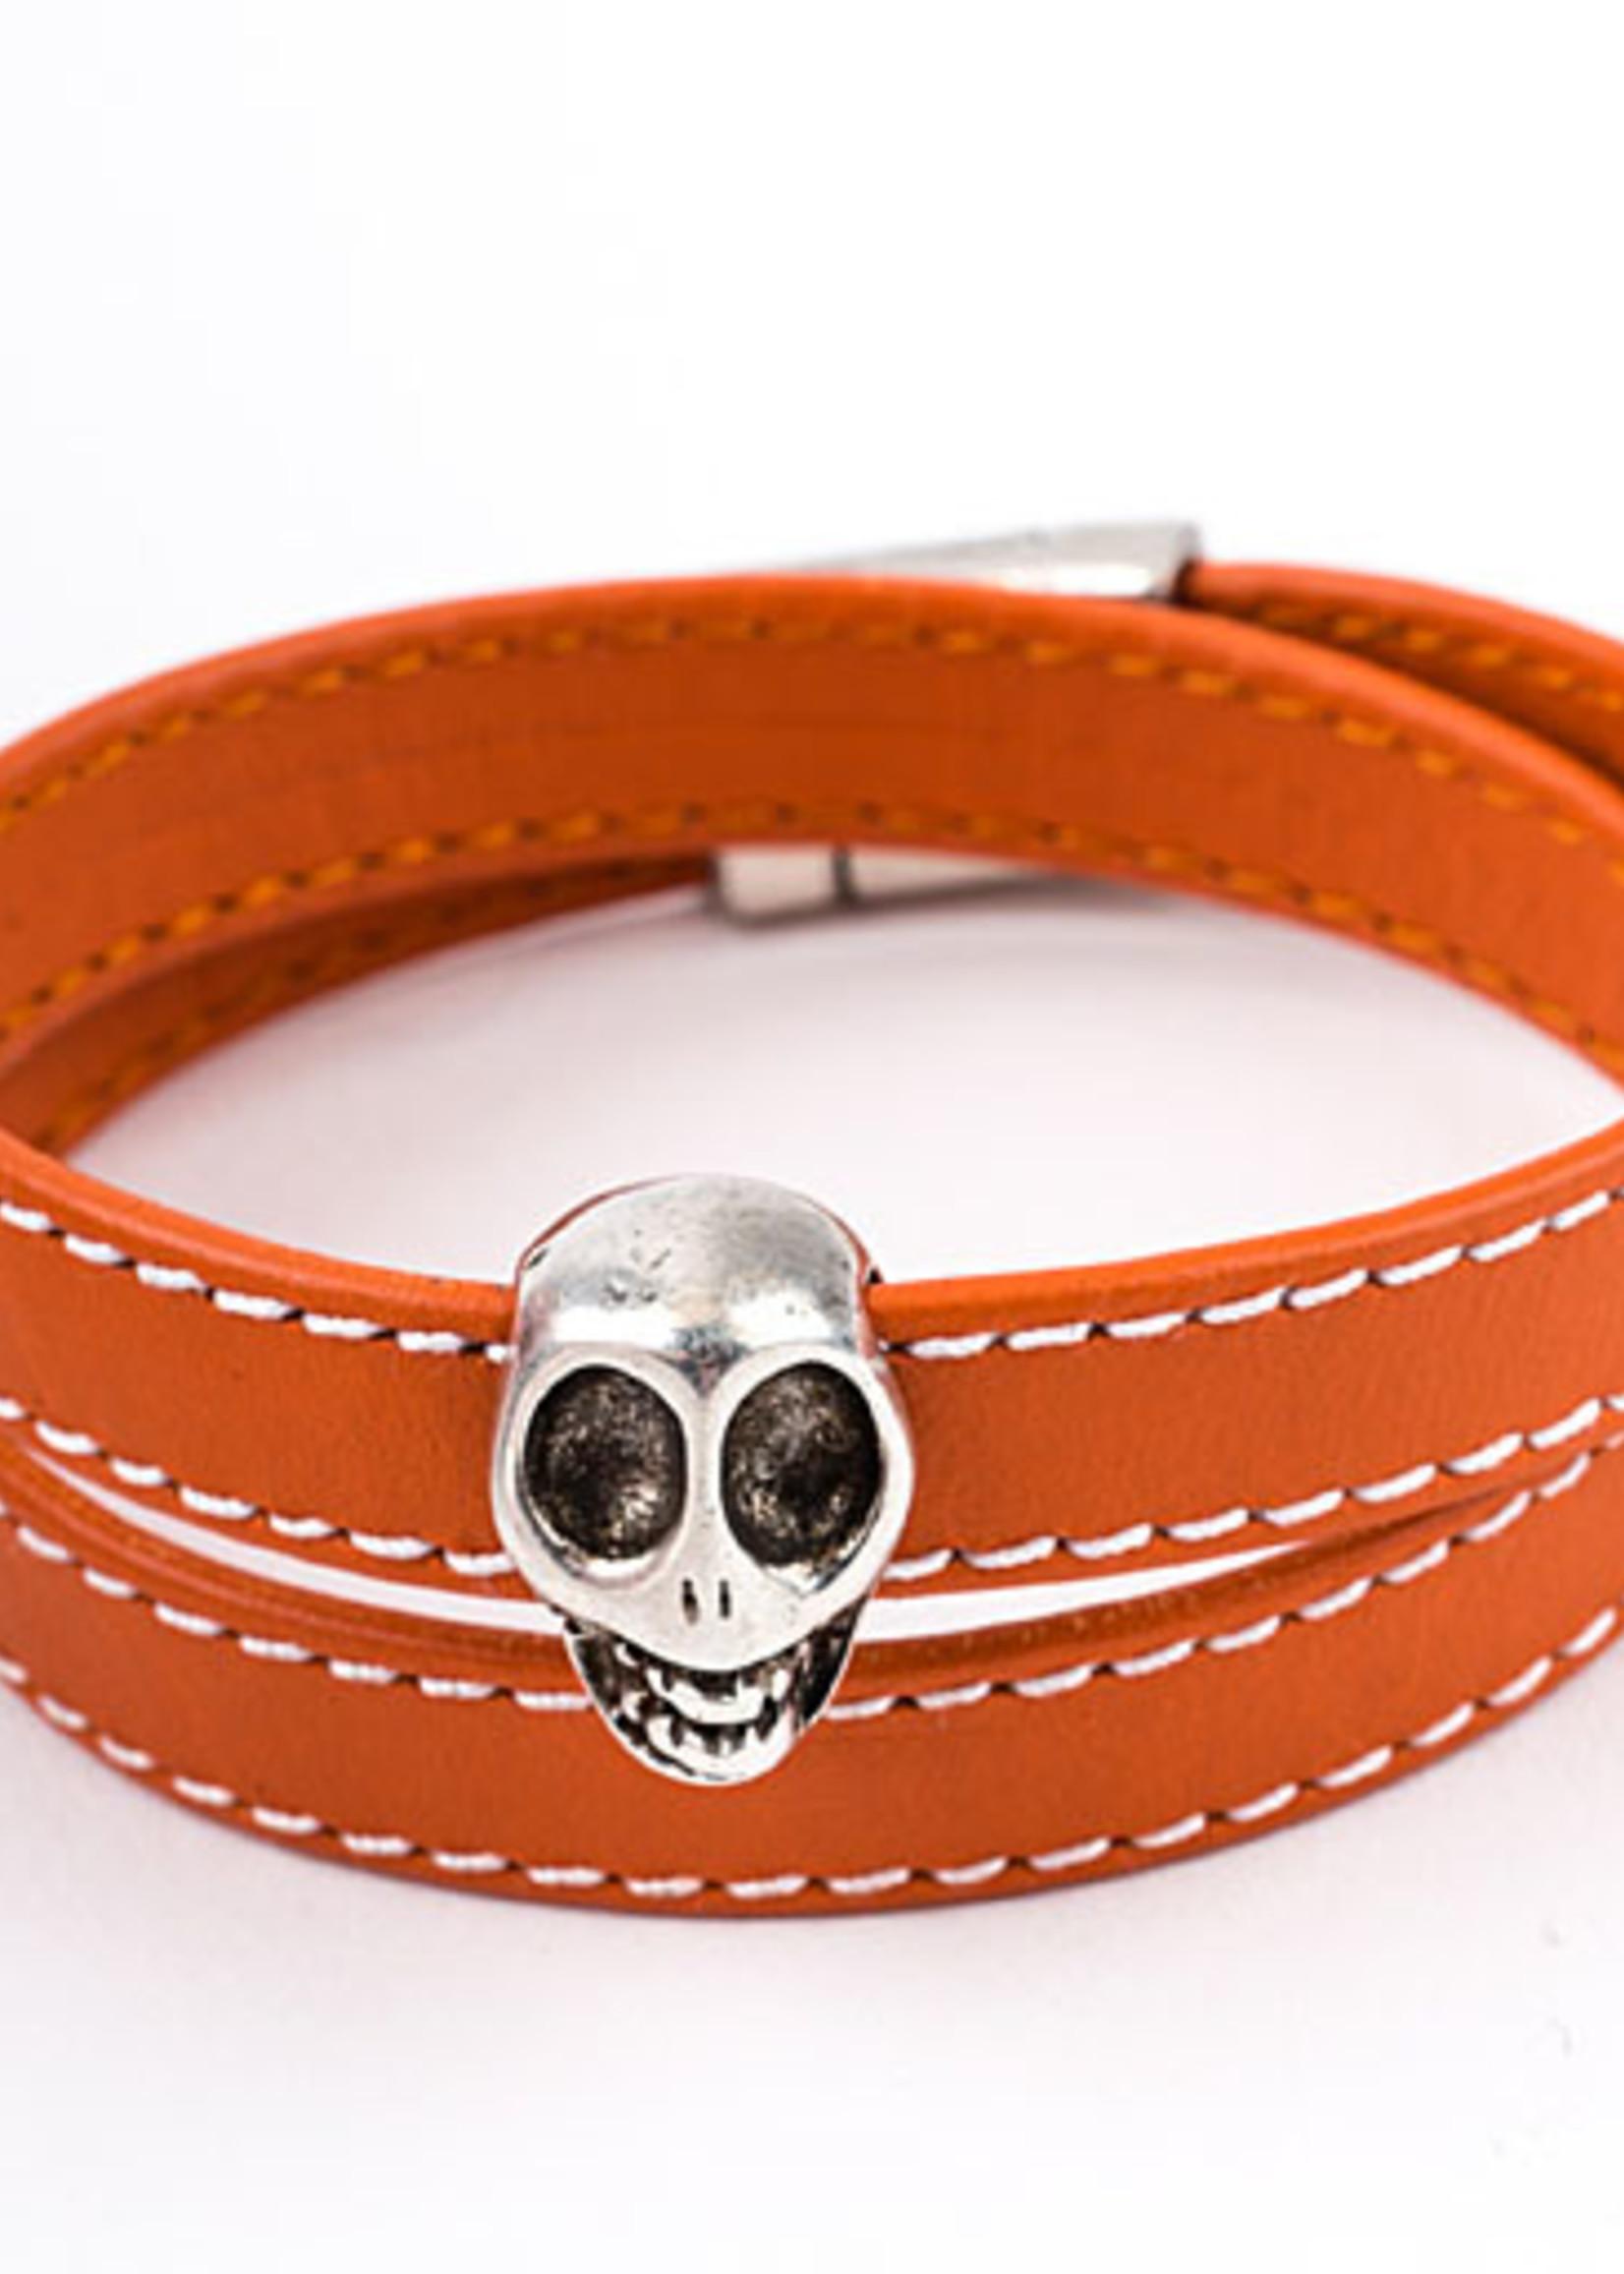 Mina Danielle Orange Leather Wrap Bracelet with Silver Skull